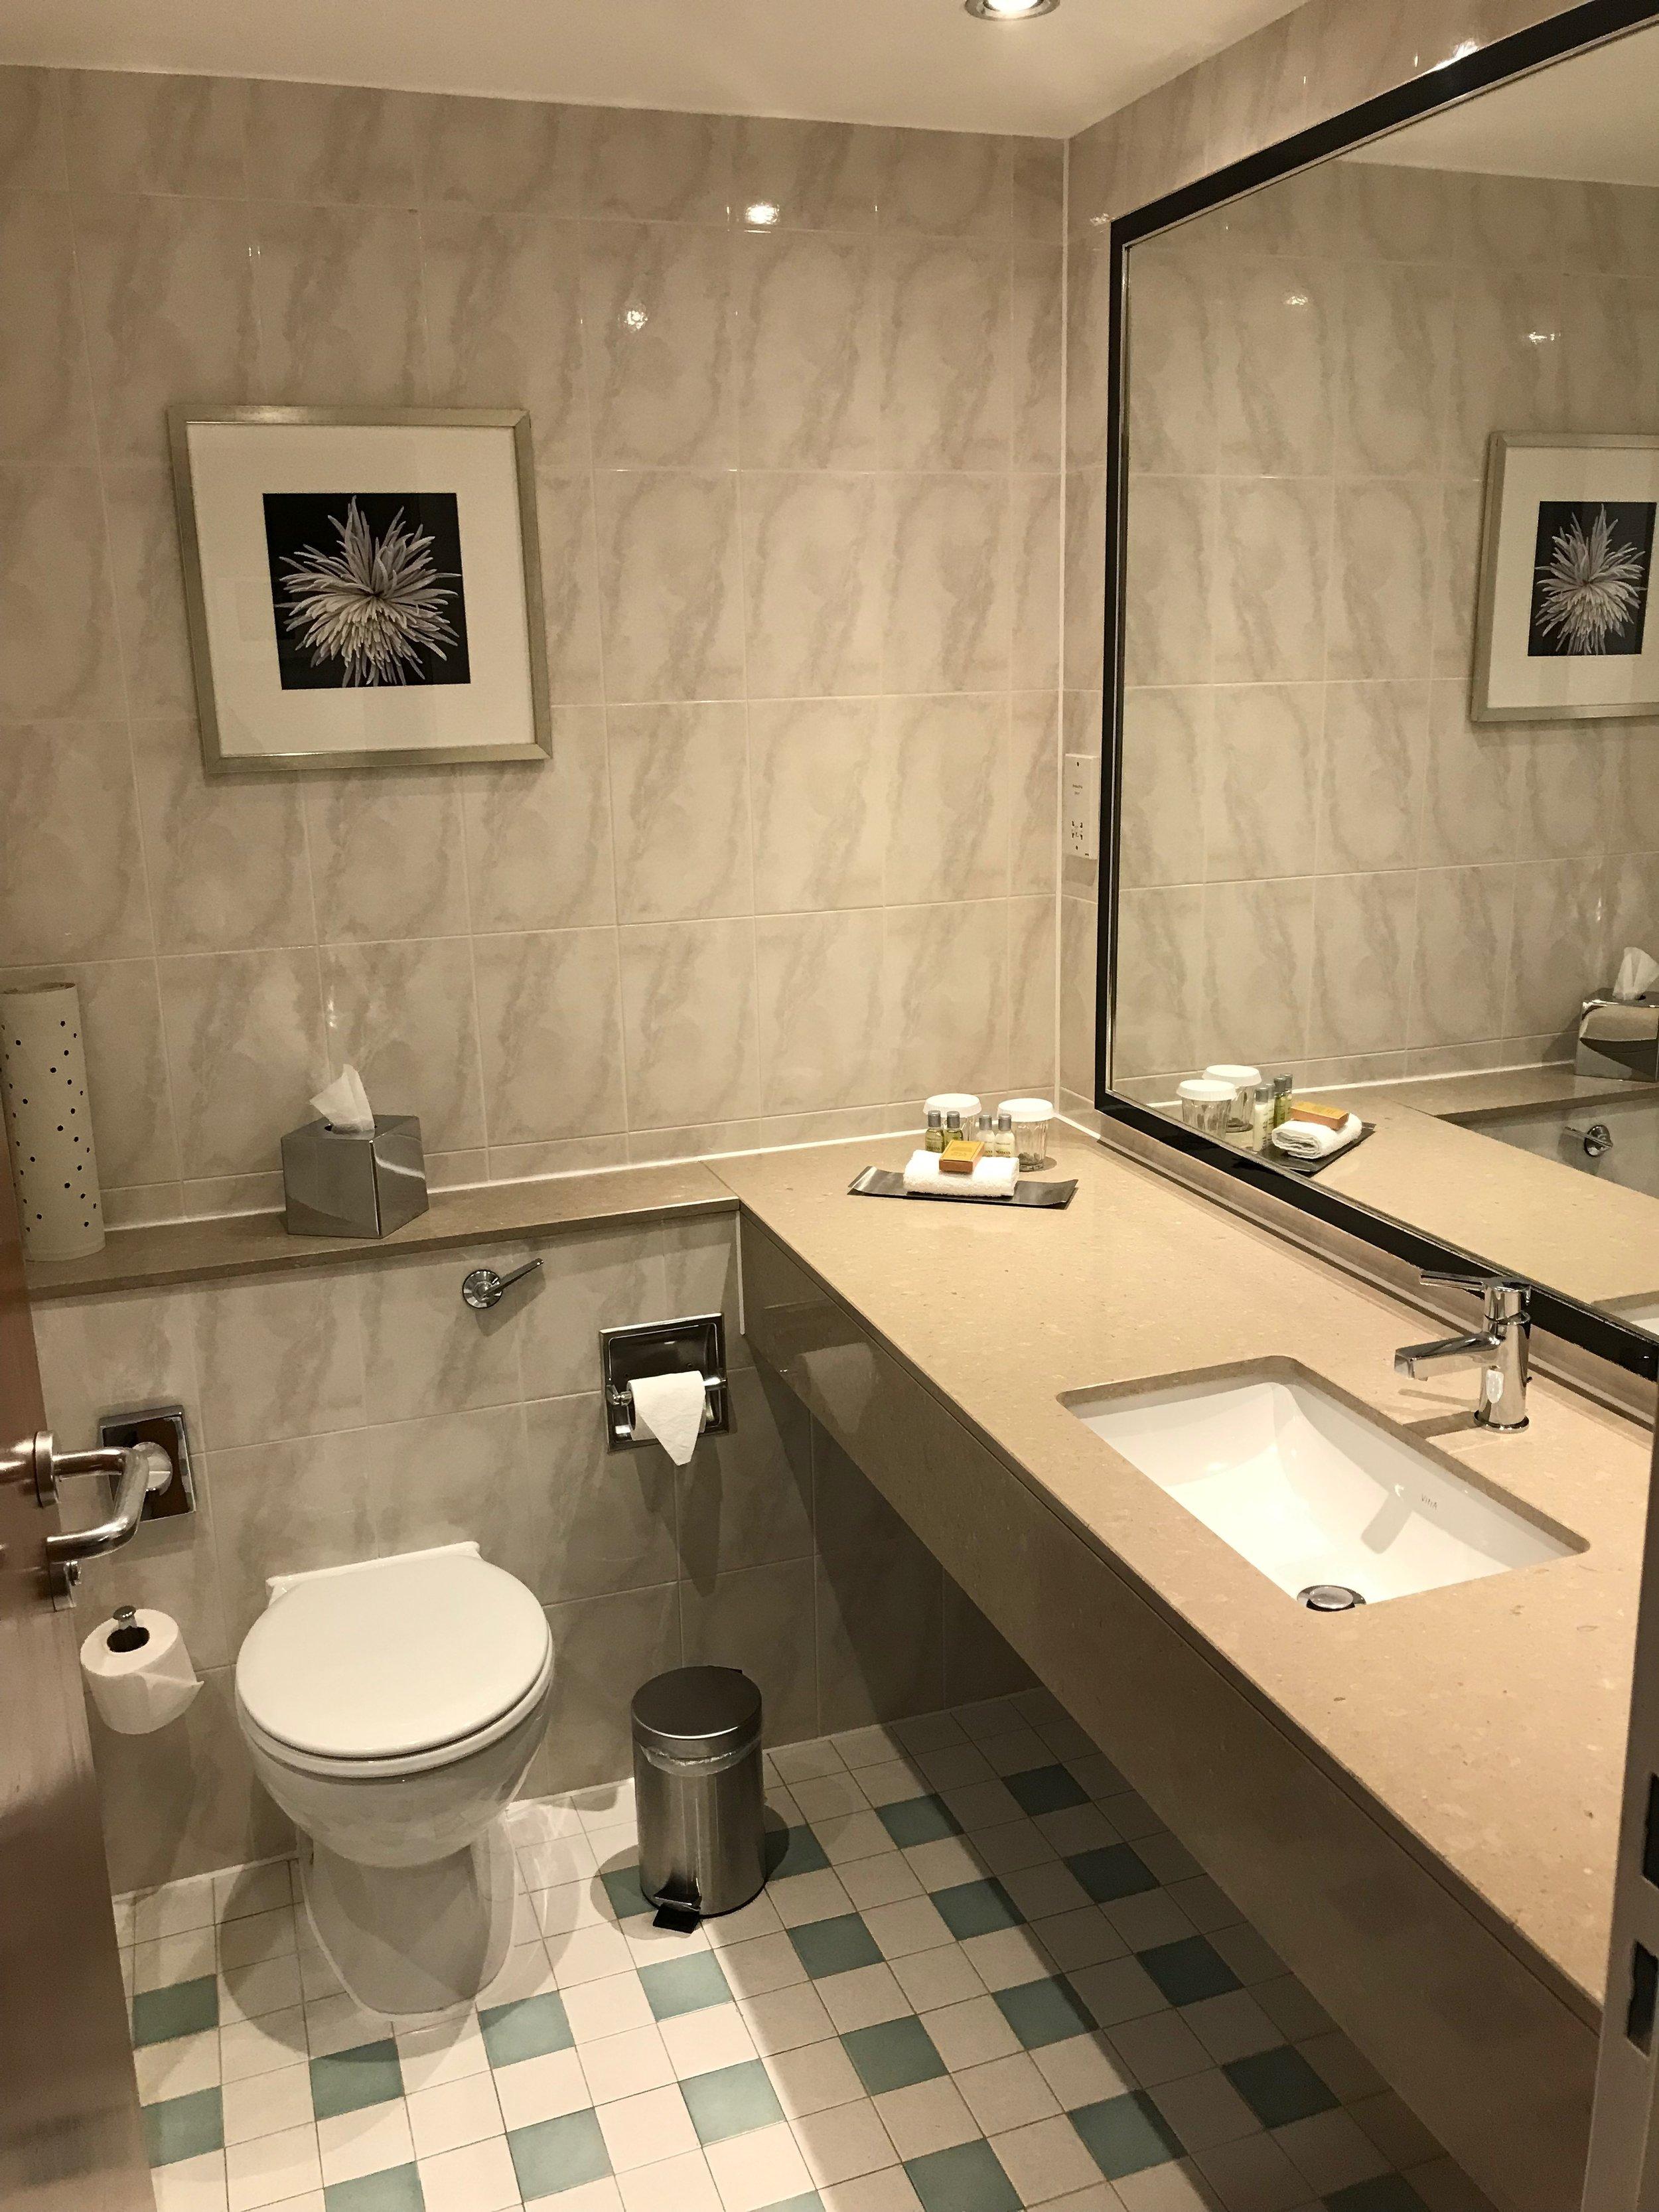 DoubleTree by Hilton Woking king room bathroom